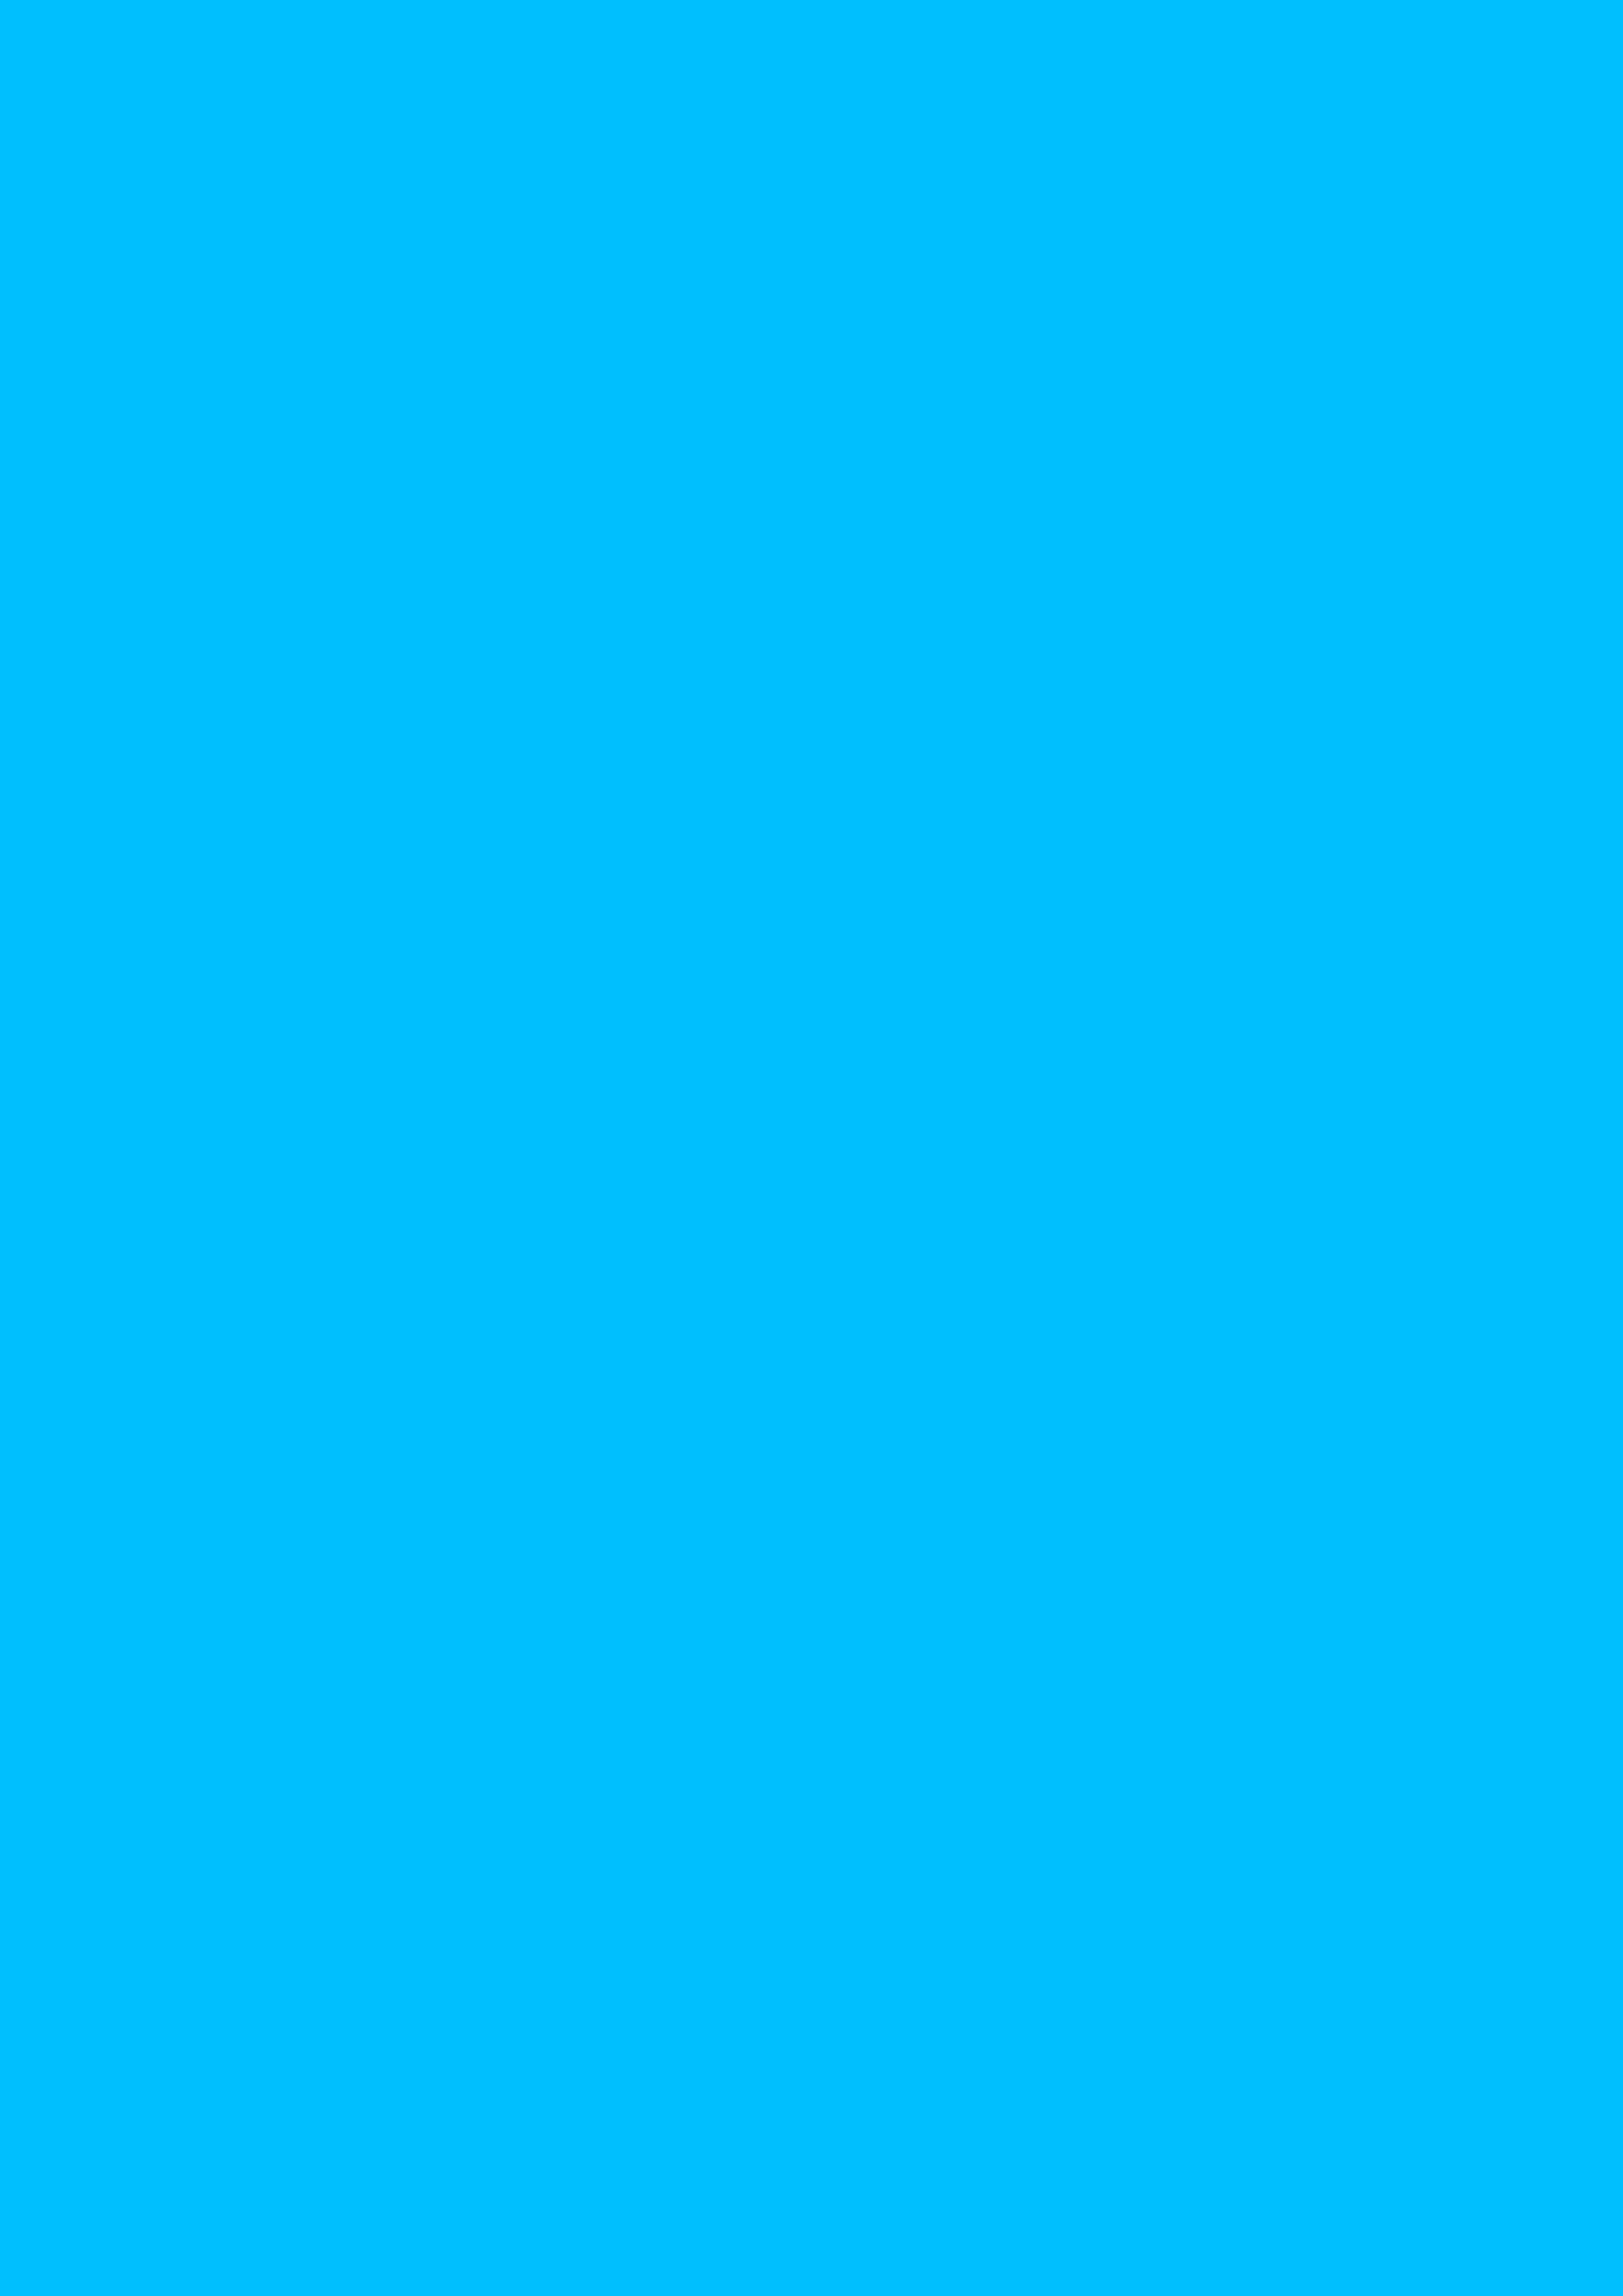 2480x3508 Capri Solid Color Background